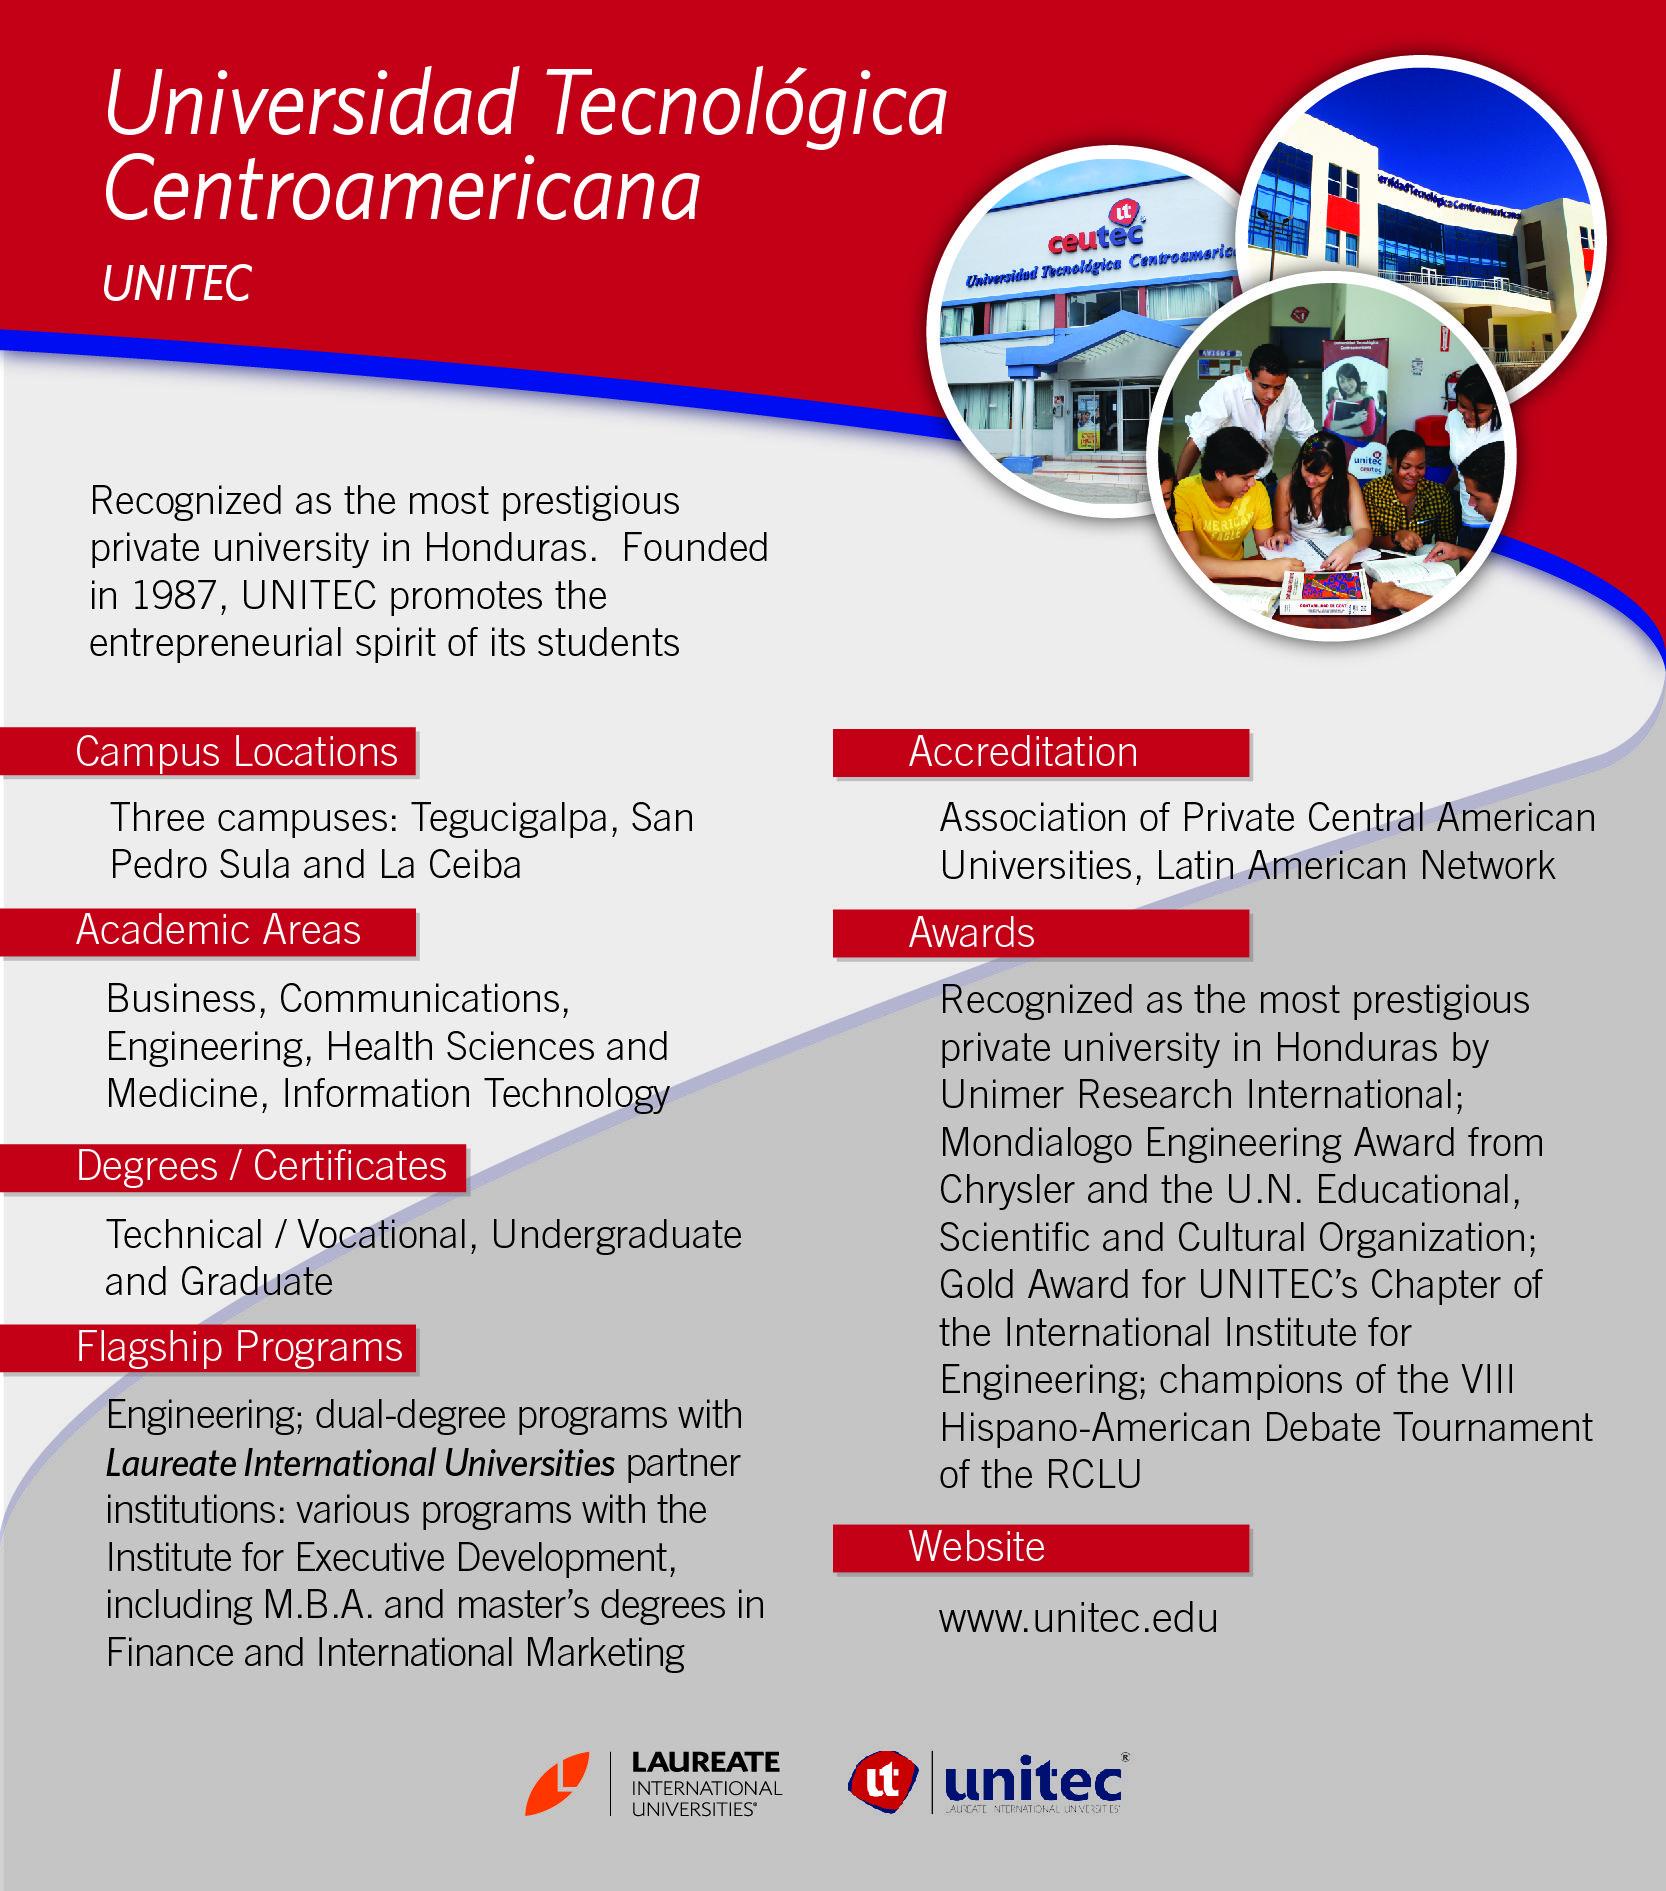 competence web design cv